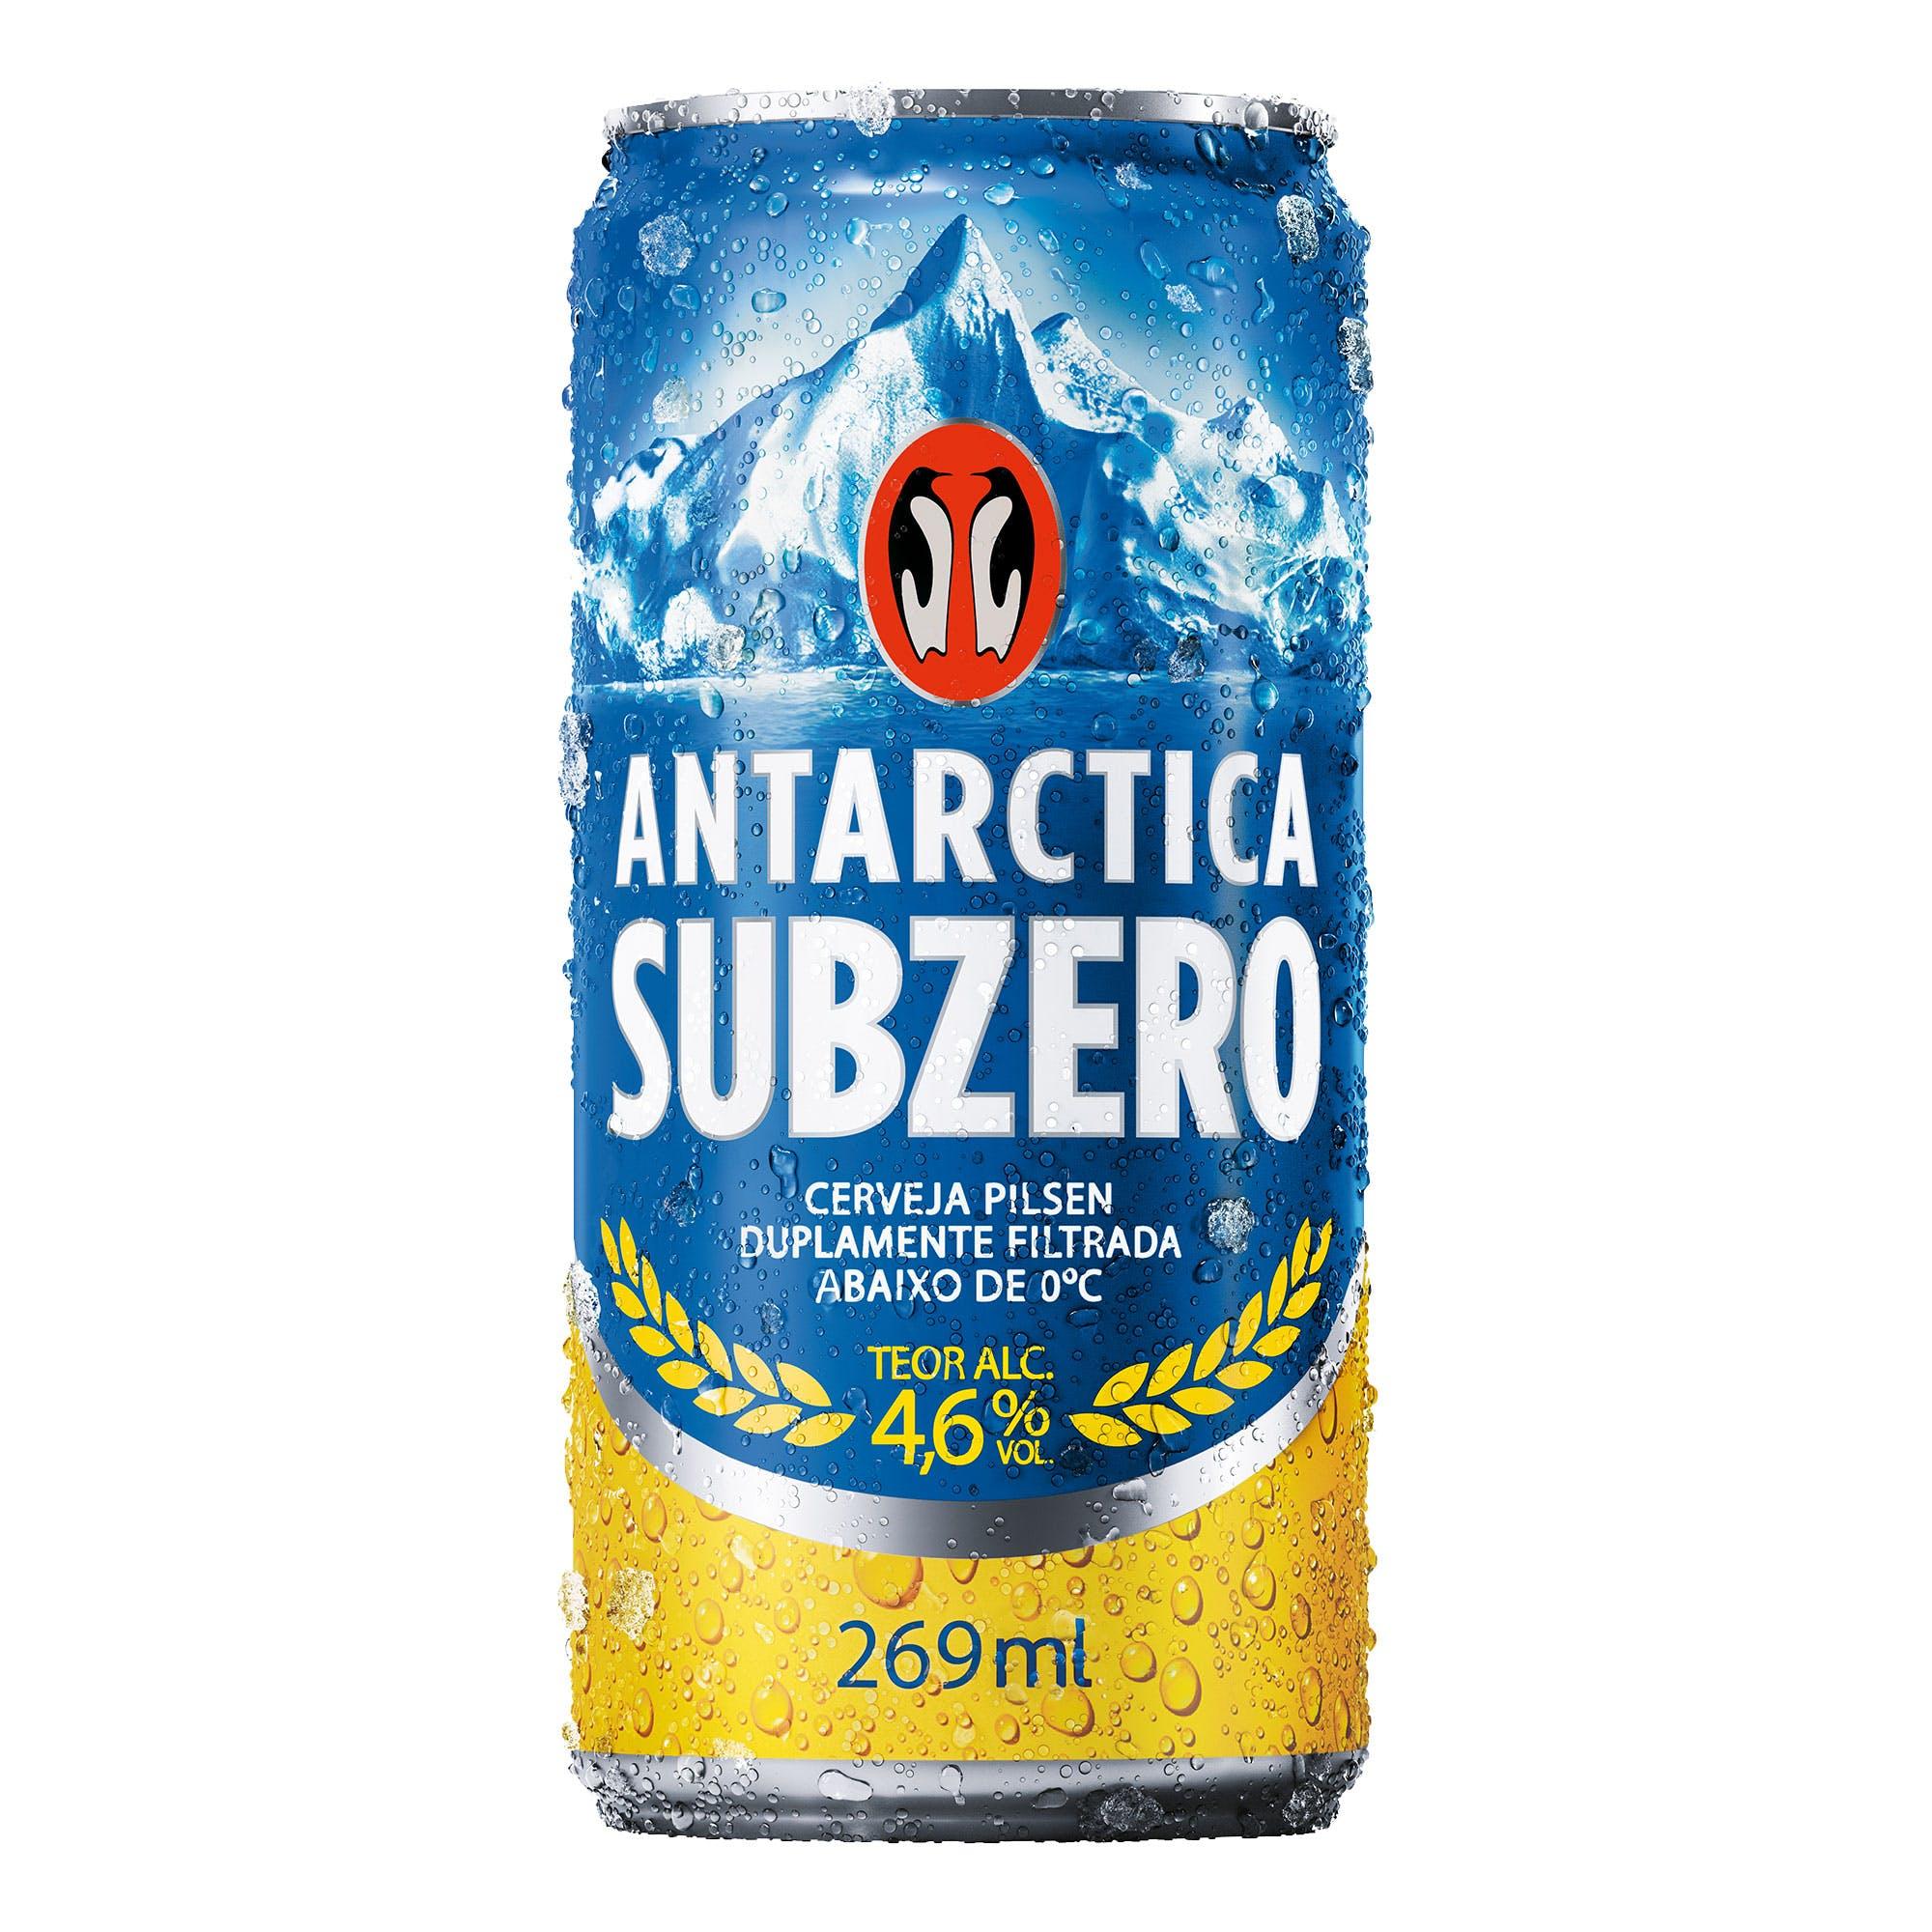 Antarctica Subzero 269ml